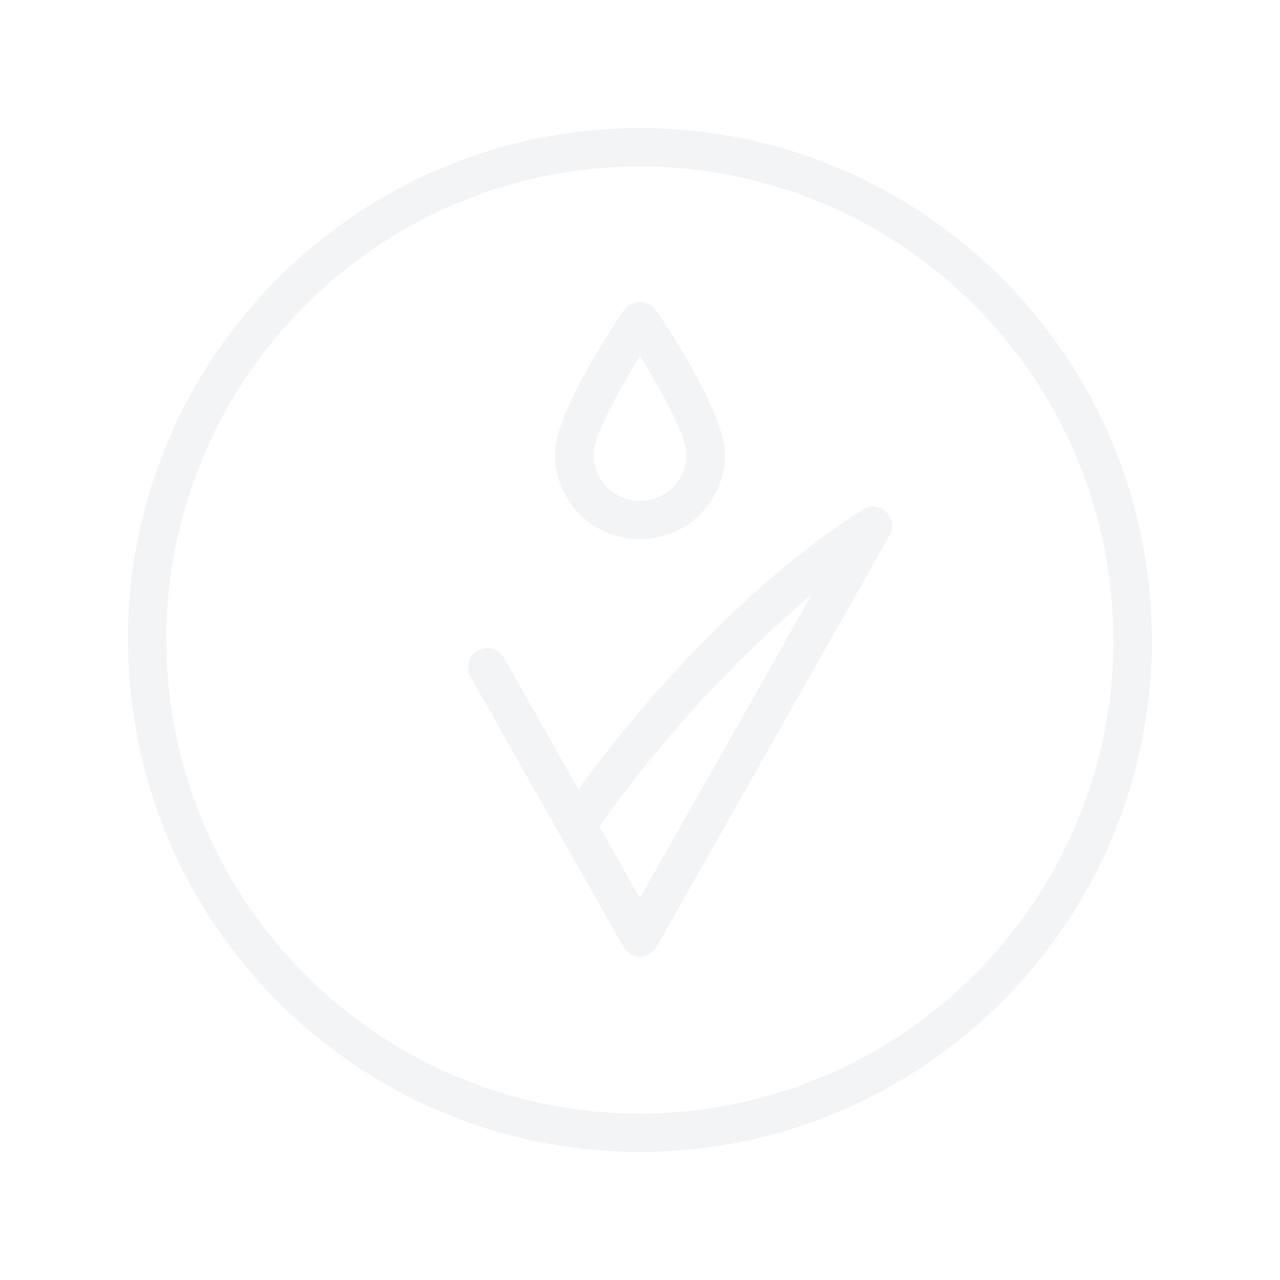 LUMENE Nordic Chic Eyebrow Shaping Wax No.2 Grey Brown 5ml